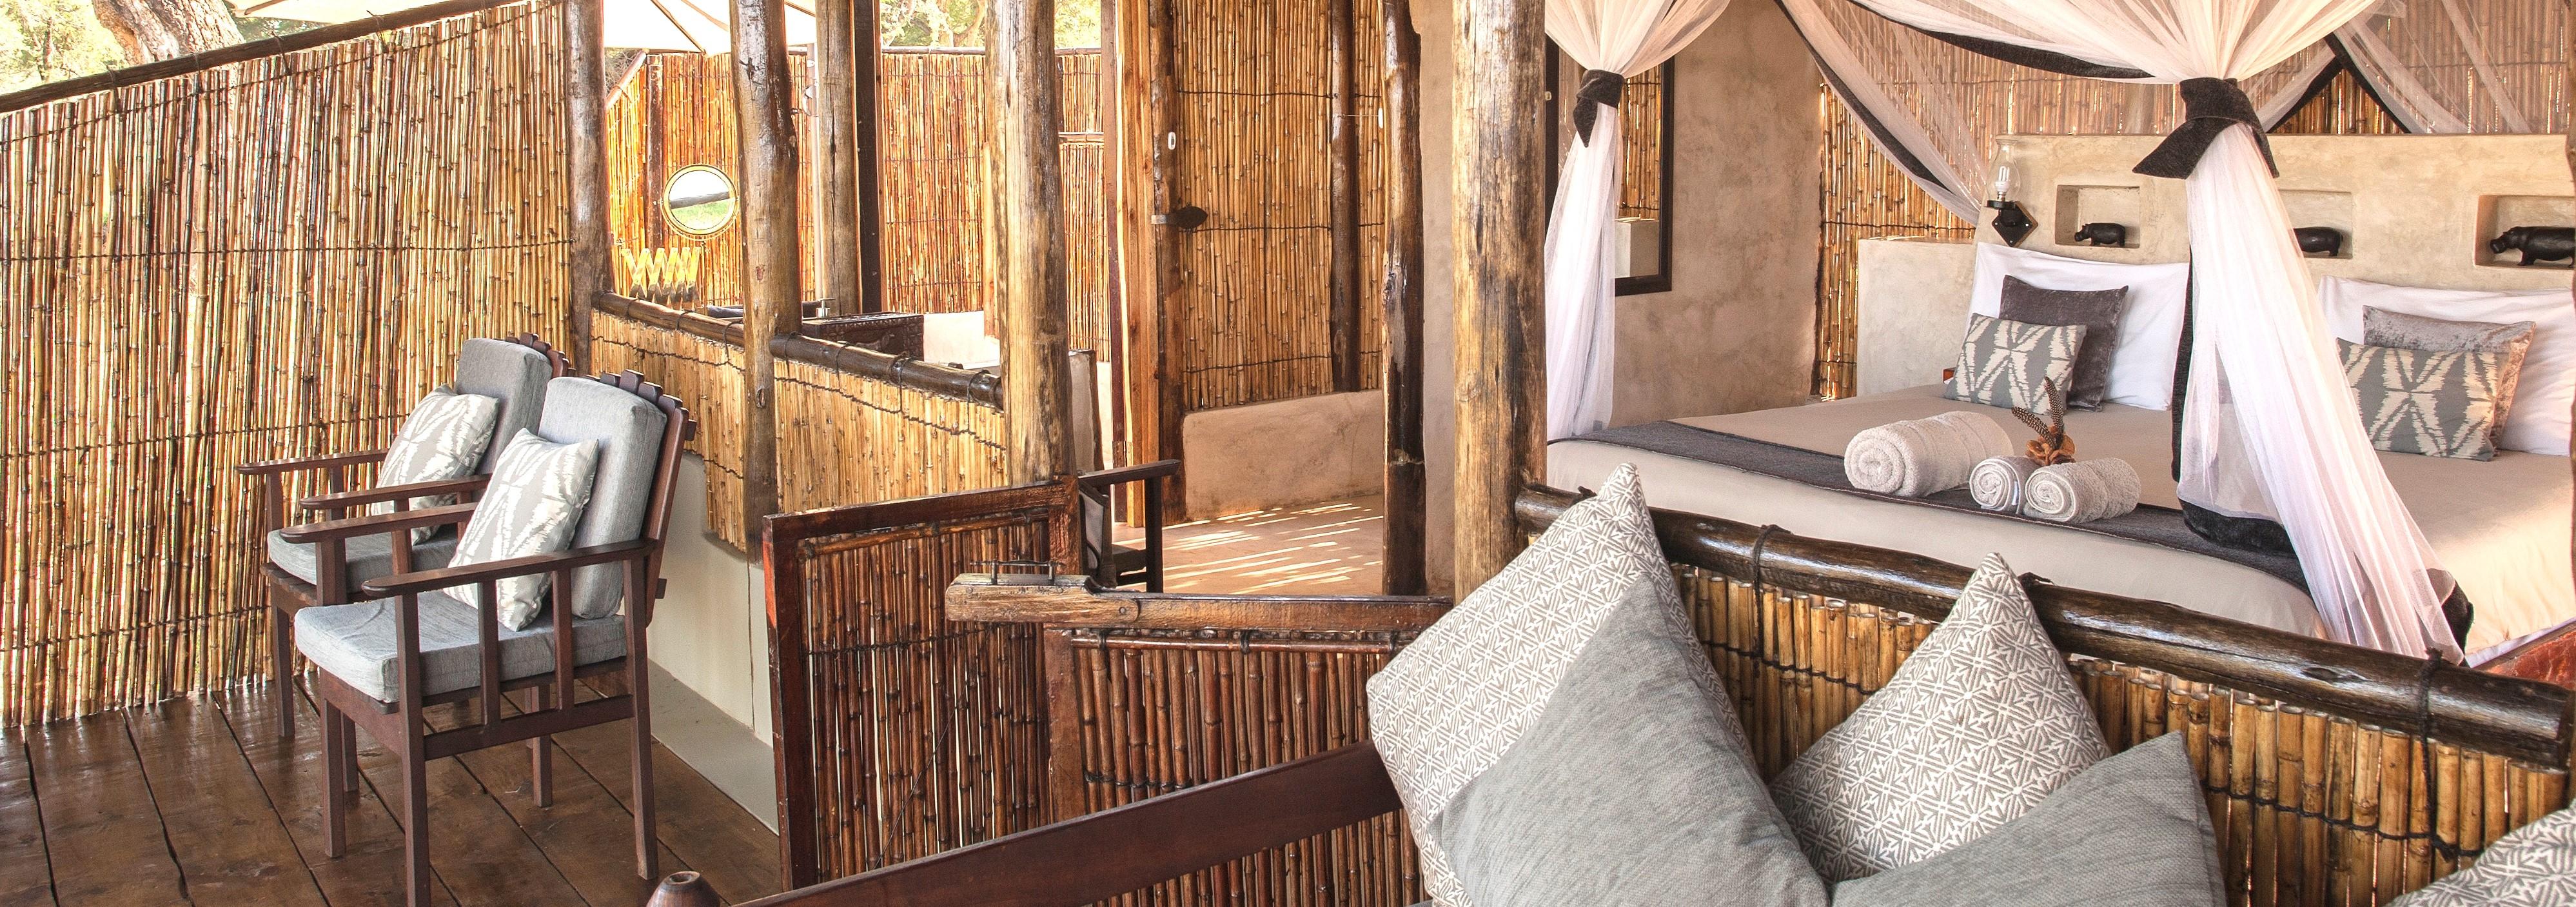 old-mondoro-luxury-tented-safari-camp